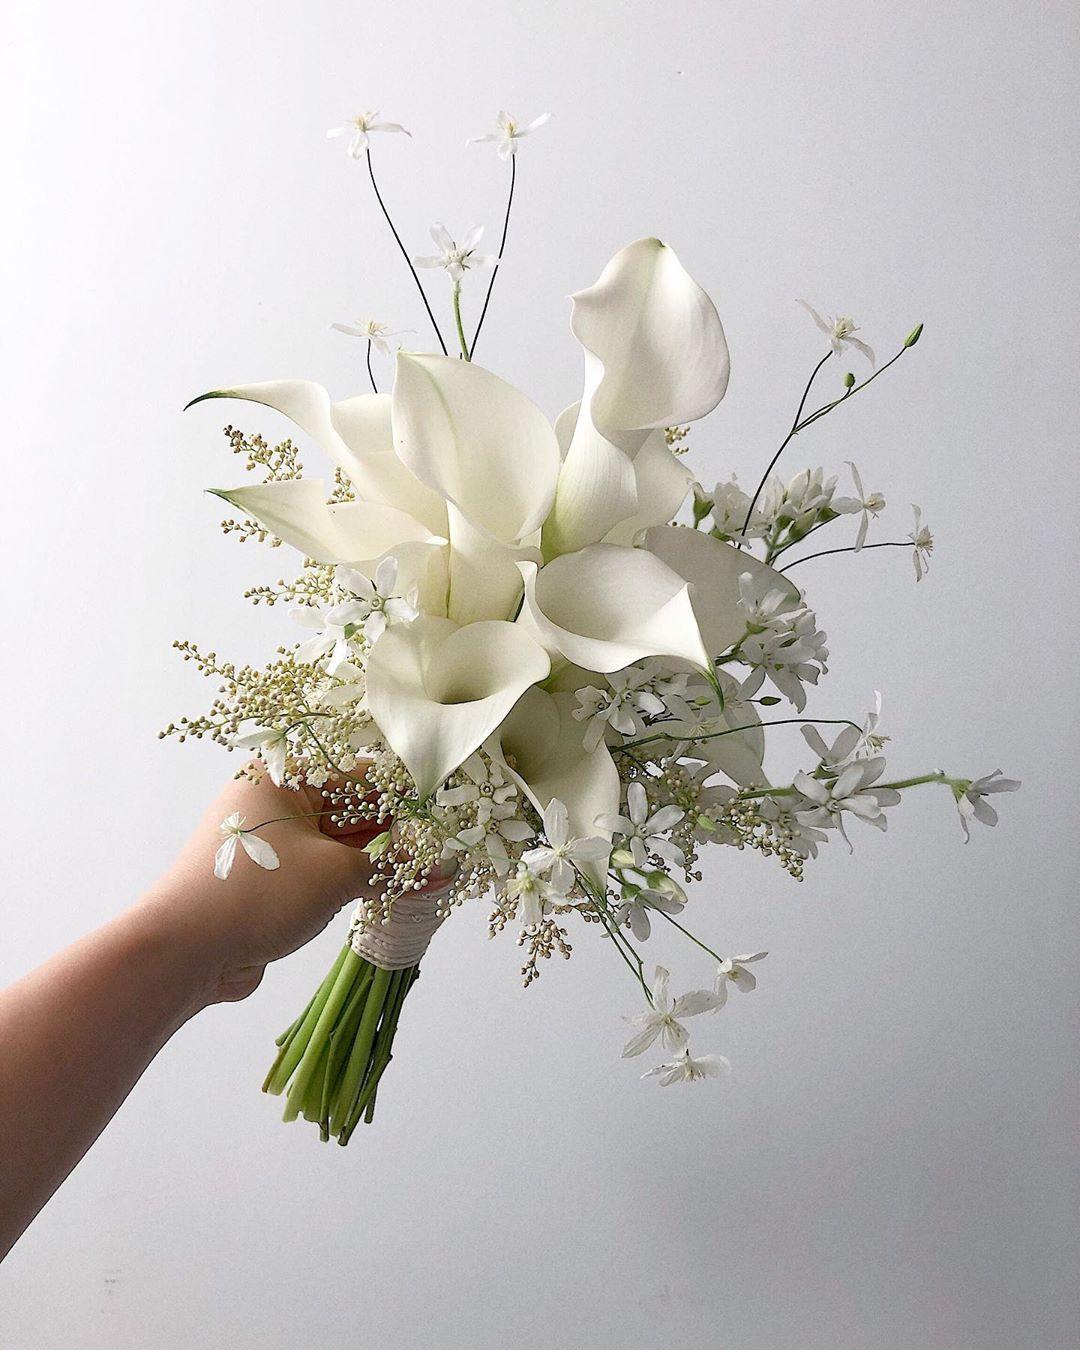 Weddingbouquet Bridalbouquet Bouquet 카라가 예쁜 계절 Calla Whitecalla 믹스부케 Mixedbouquet 웨딩부케 본식부케 린다 결혼식 꽃꽂이 결혼식 꽃 작은 꽃꽂이